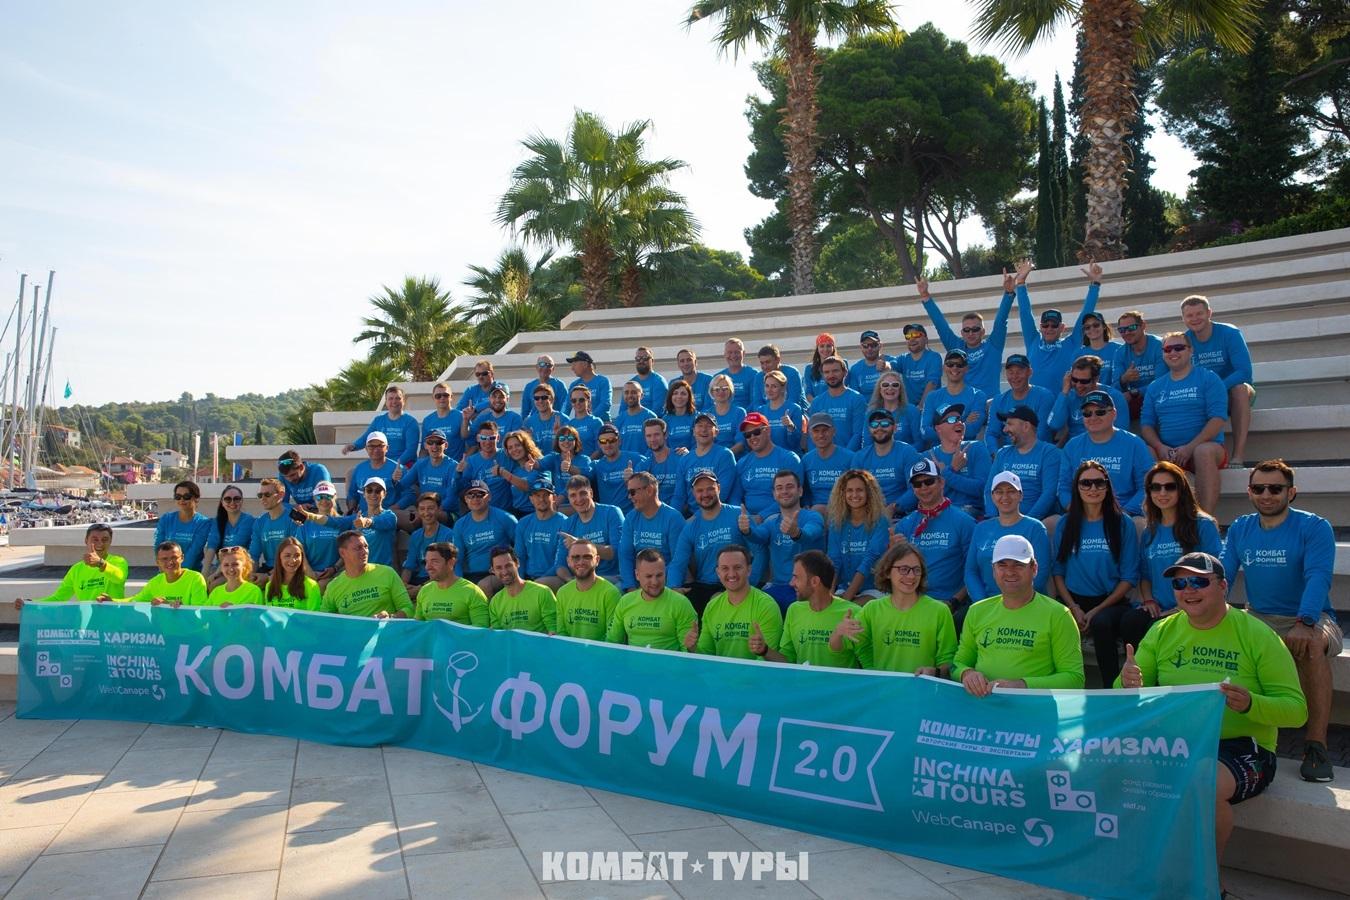 Участники Комбат-форума | Комбат-форум 2.0 в Хорватии 2018